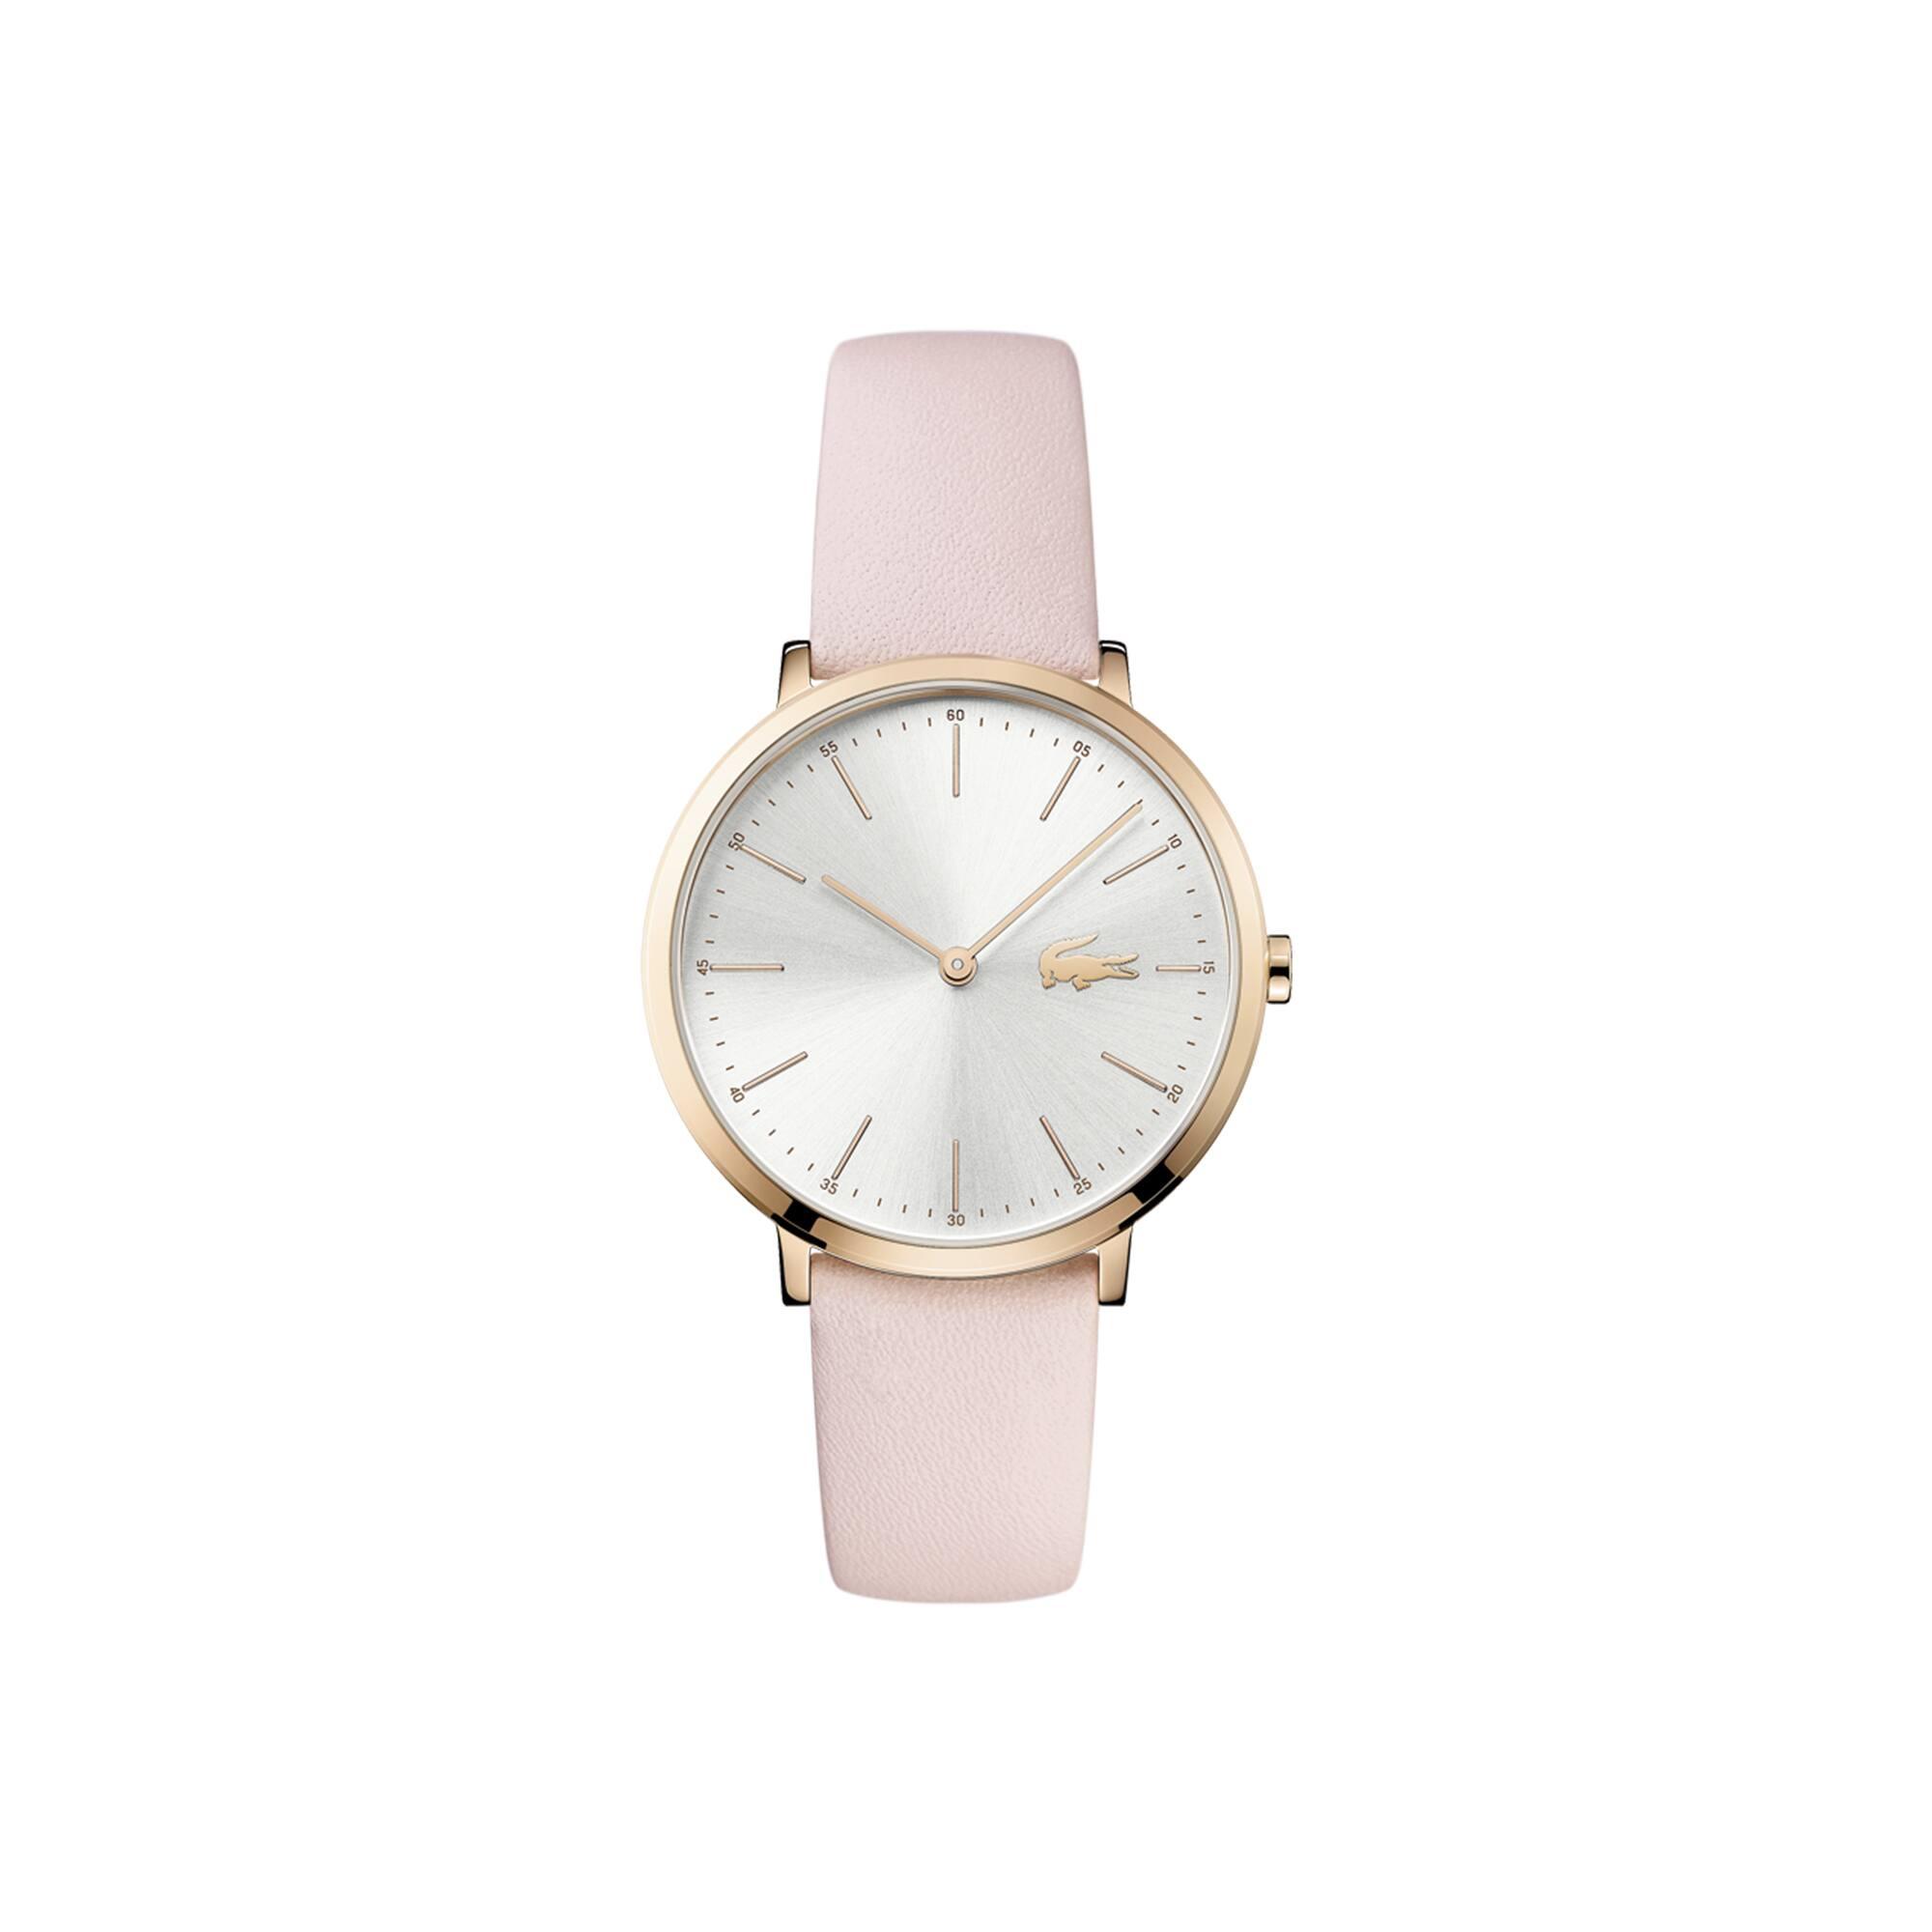 Relógio ultra slim Moon de mulher com bracelete de pele rosa